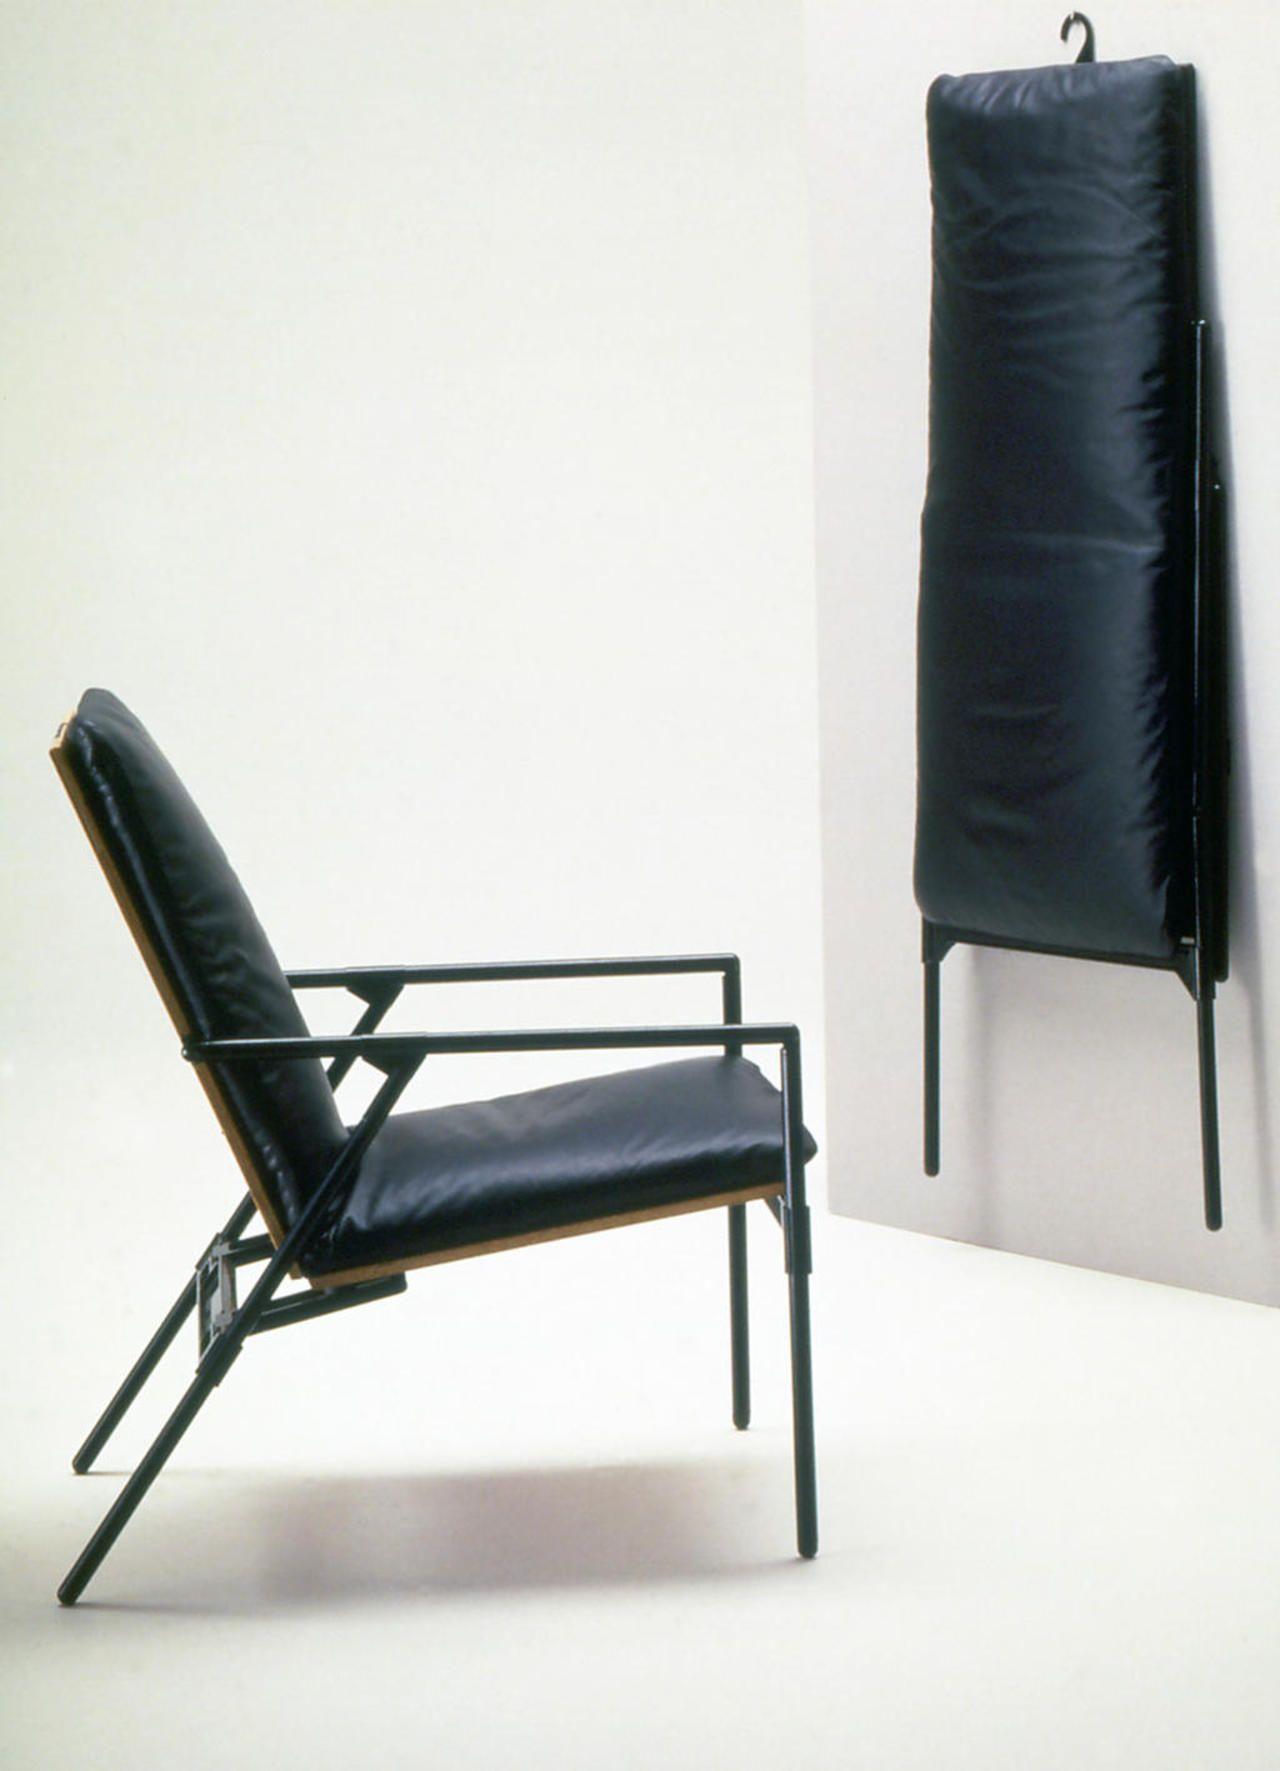 Richard Sapper Nena 1984 Folding Armchair Chair Design Furniture Design Chair